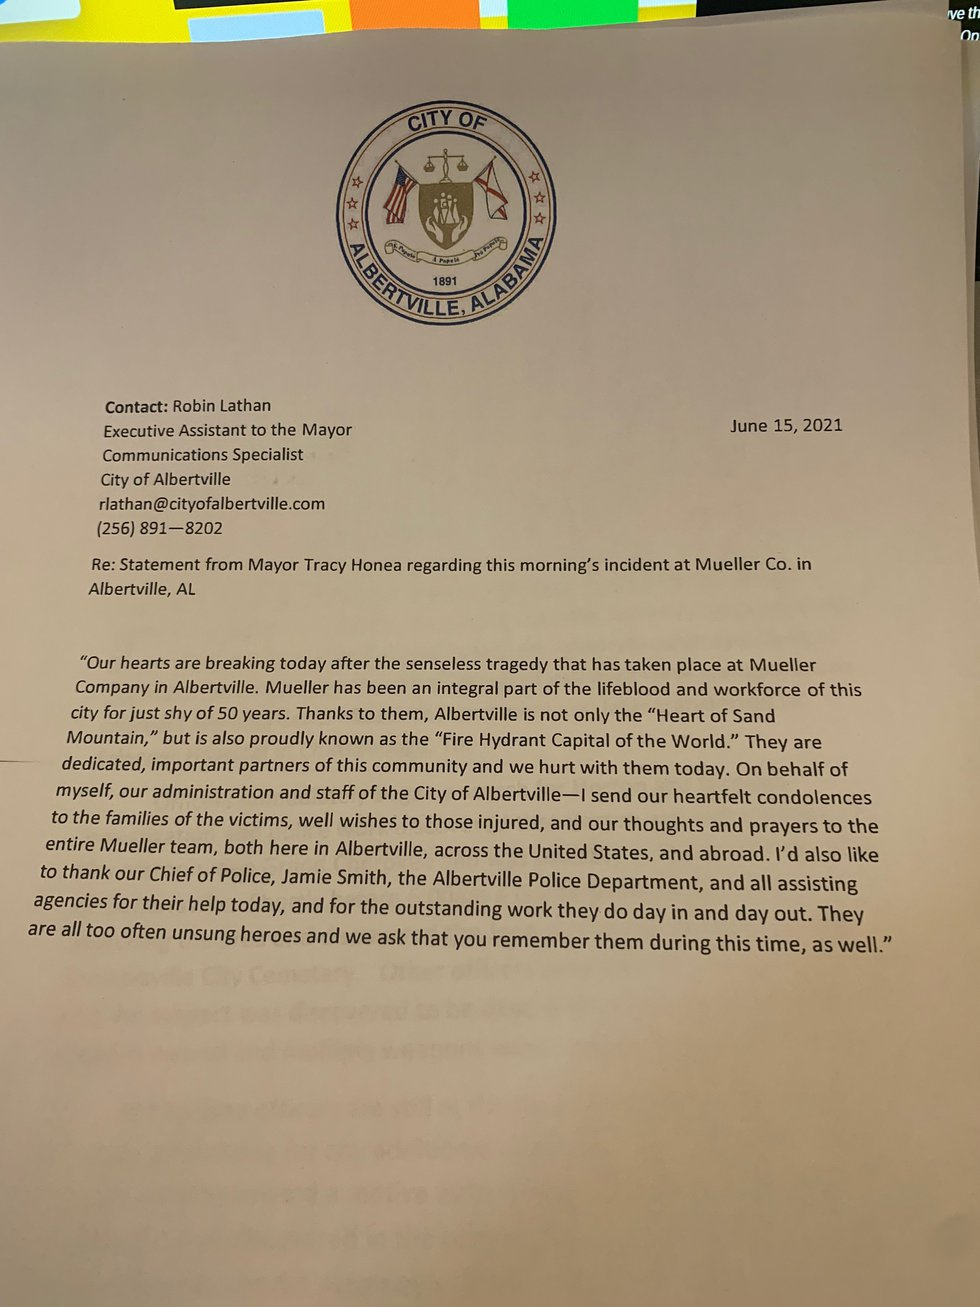 Statement from the Albertville Mayor